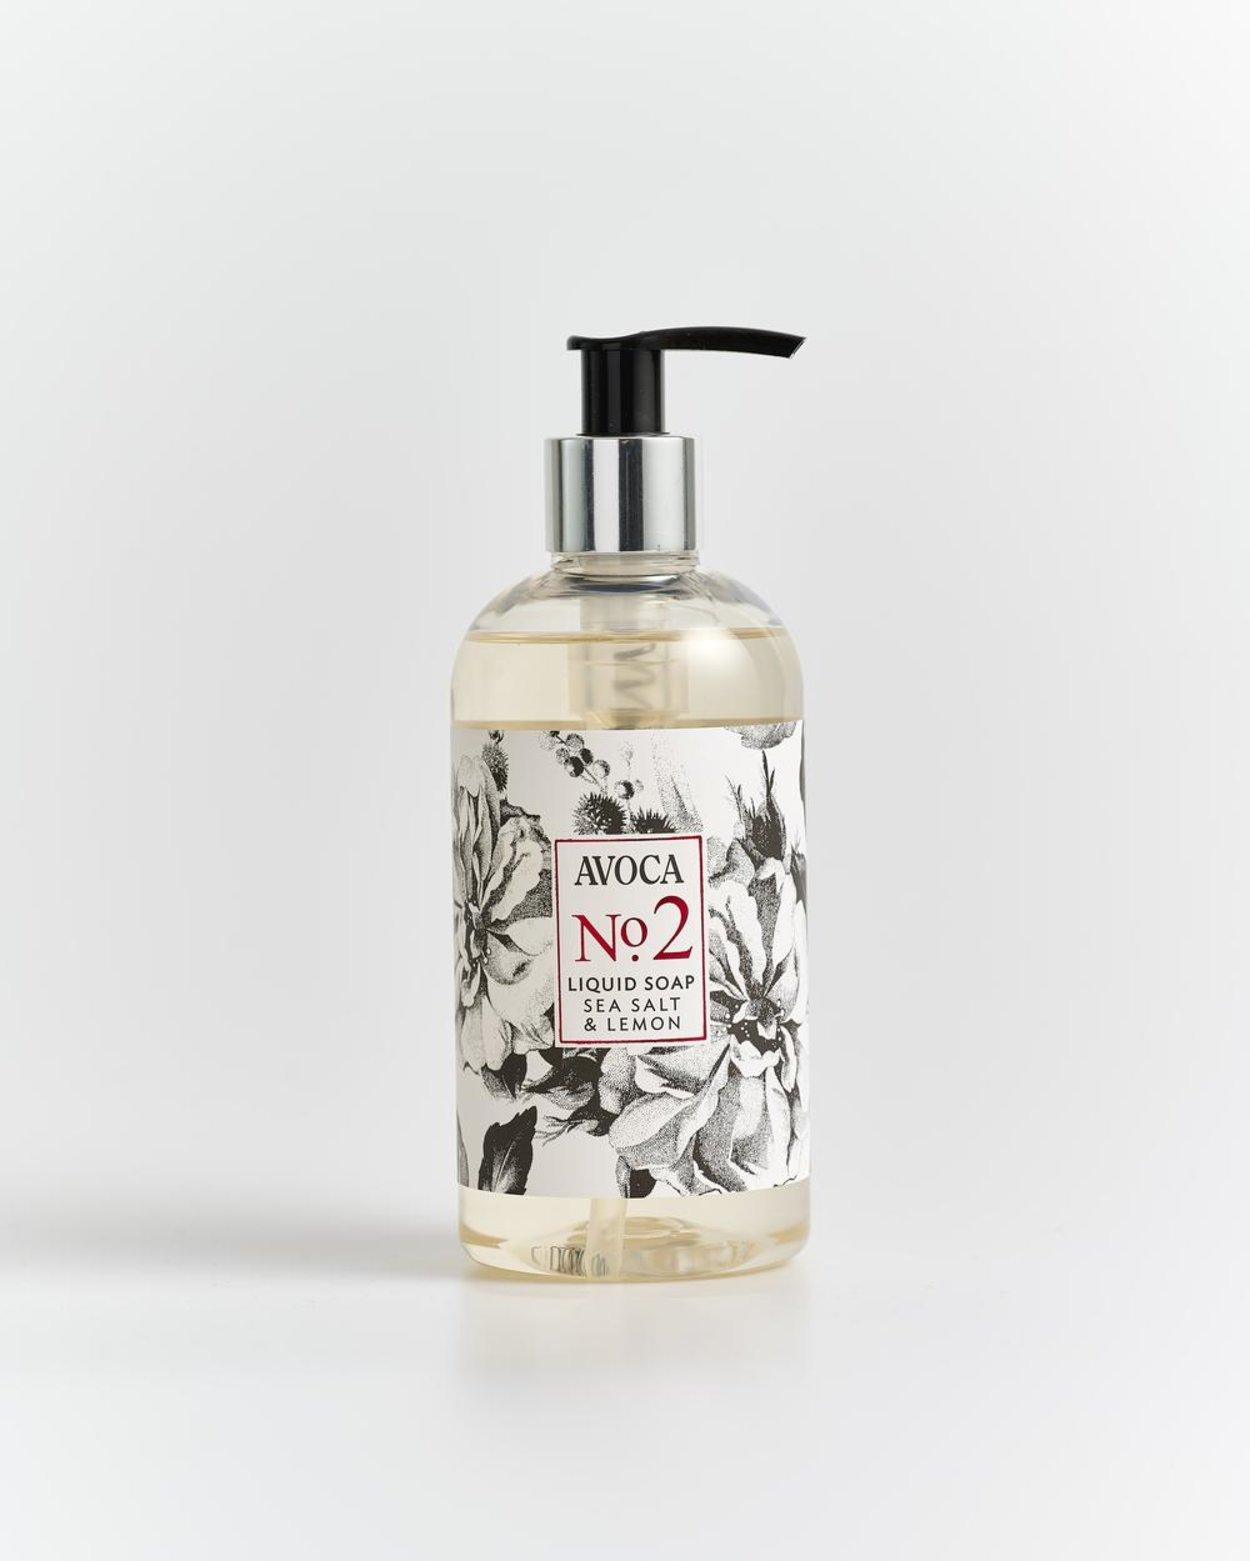 No. 2 Sea Salt & Lemon Liquid Soap